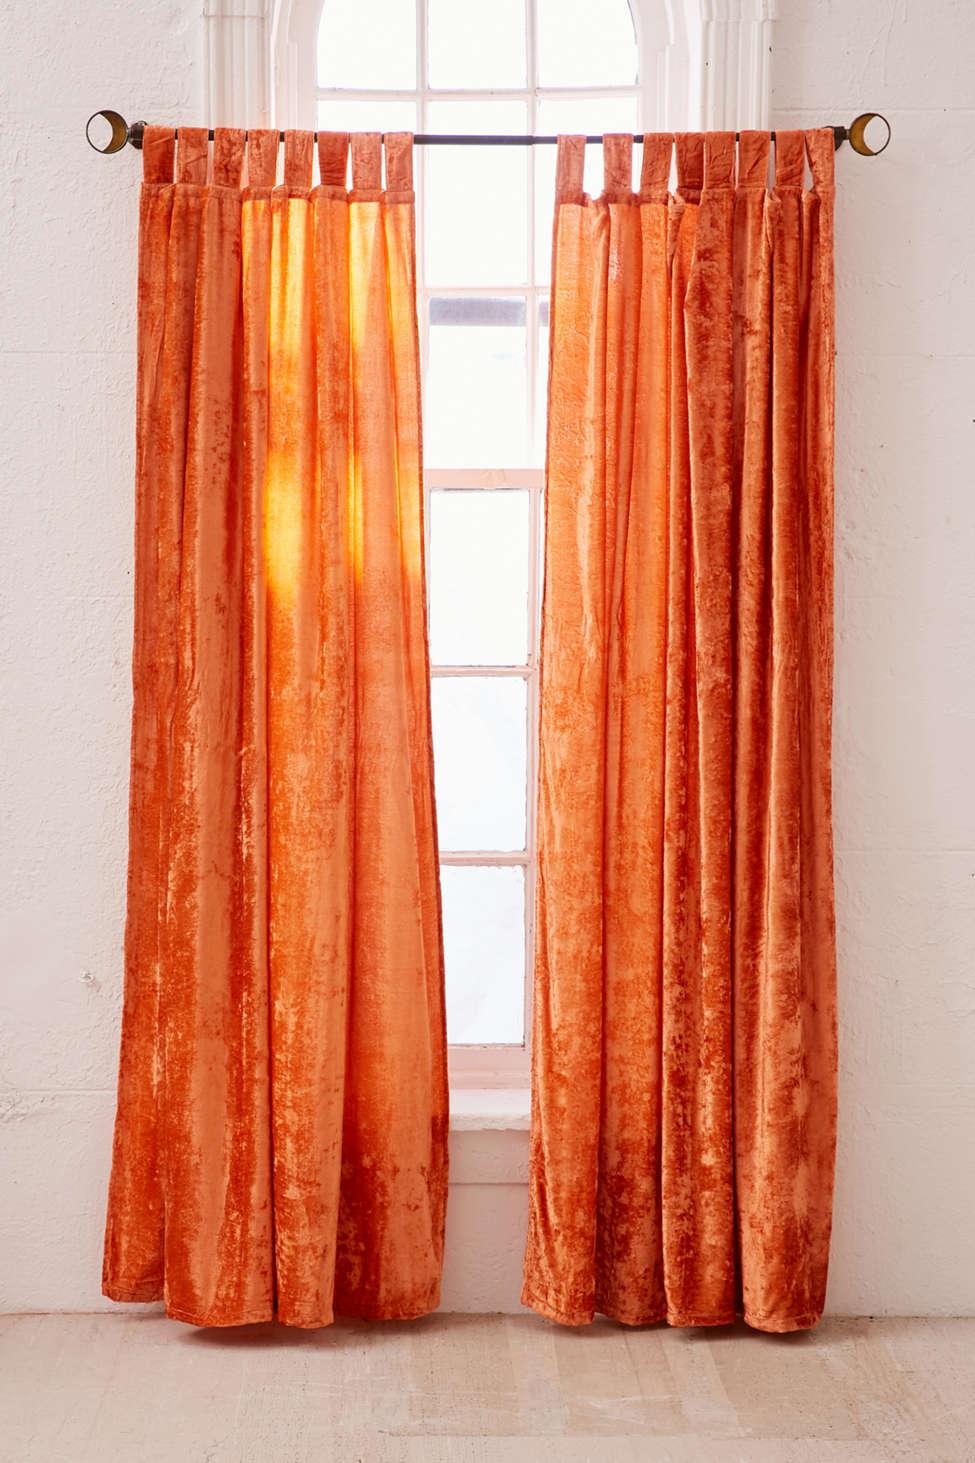 Slide View: 1: Crushed Velvet Window Curtain